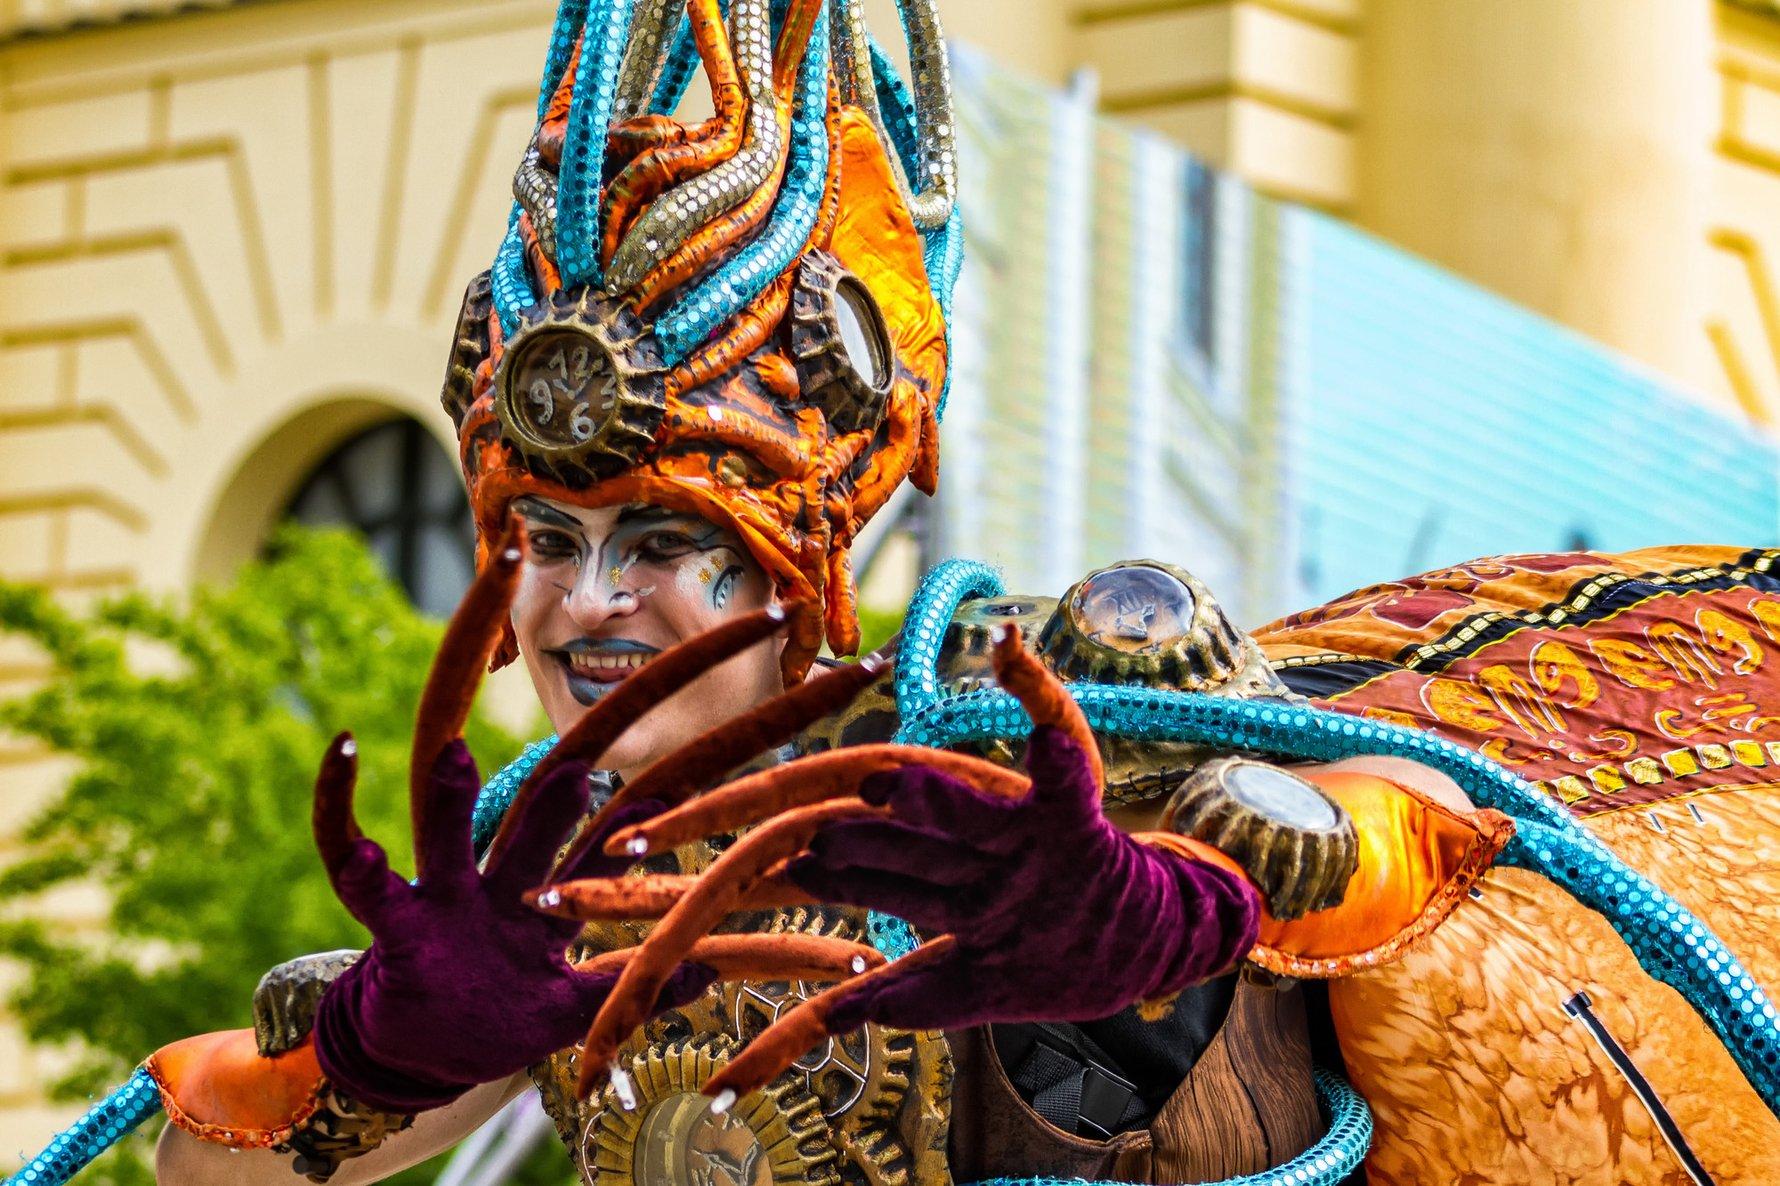 Carnival Dalido in Debrecen Hungary © Yanosh Nemesh / Shutterstock.com